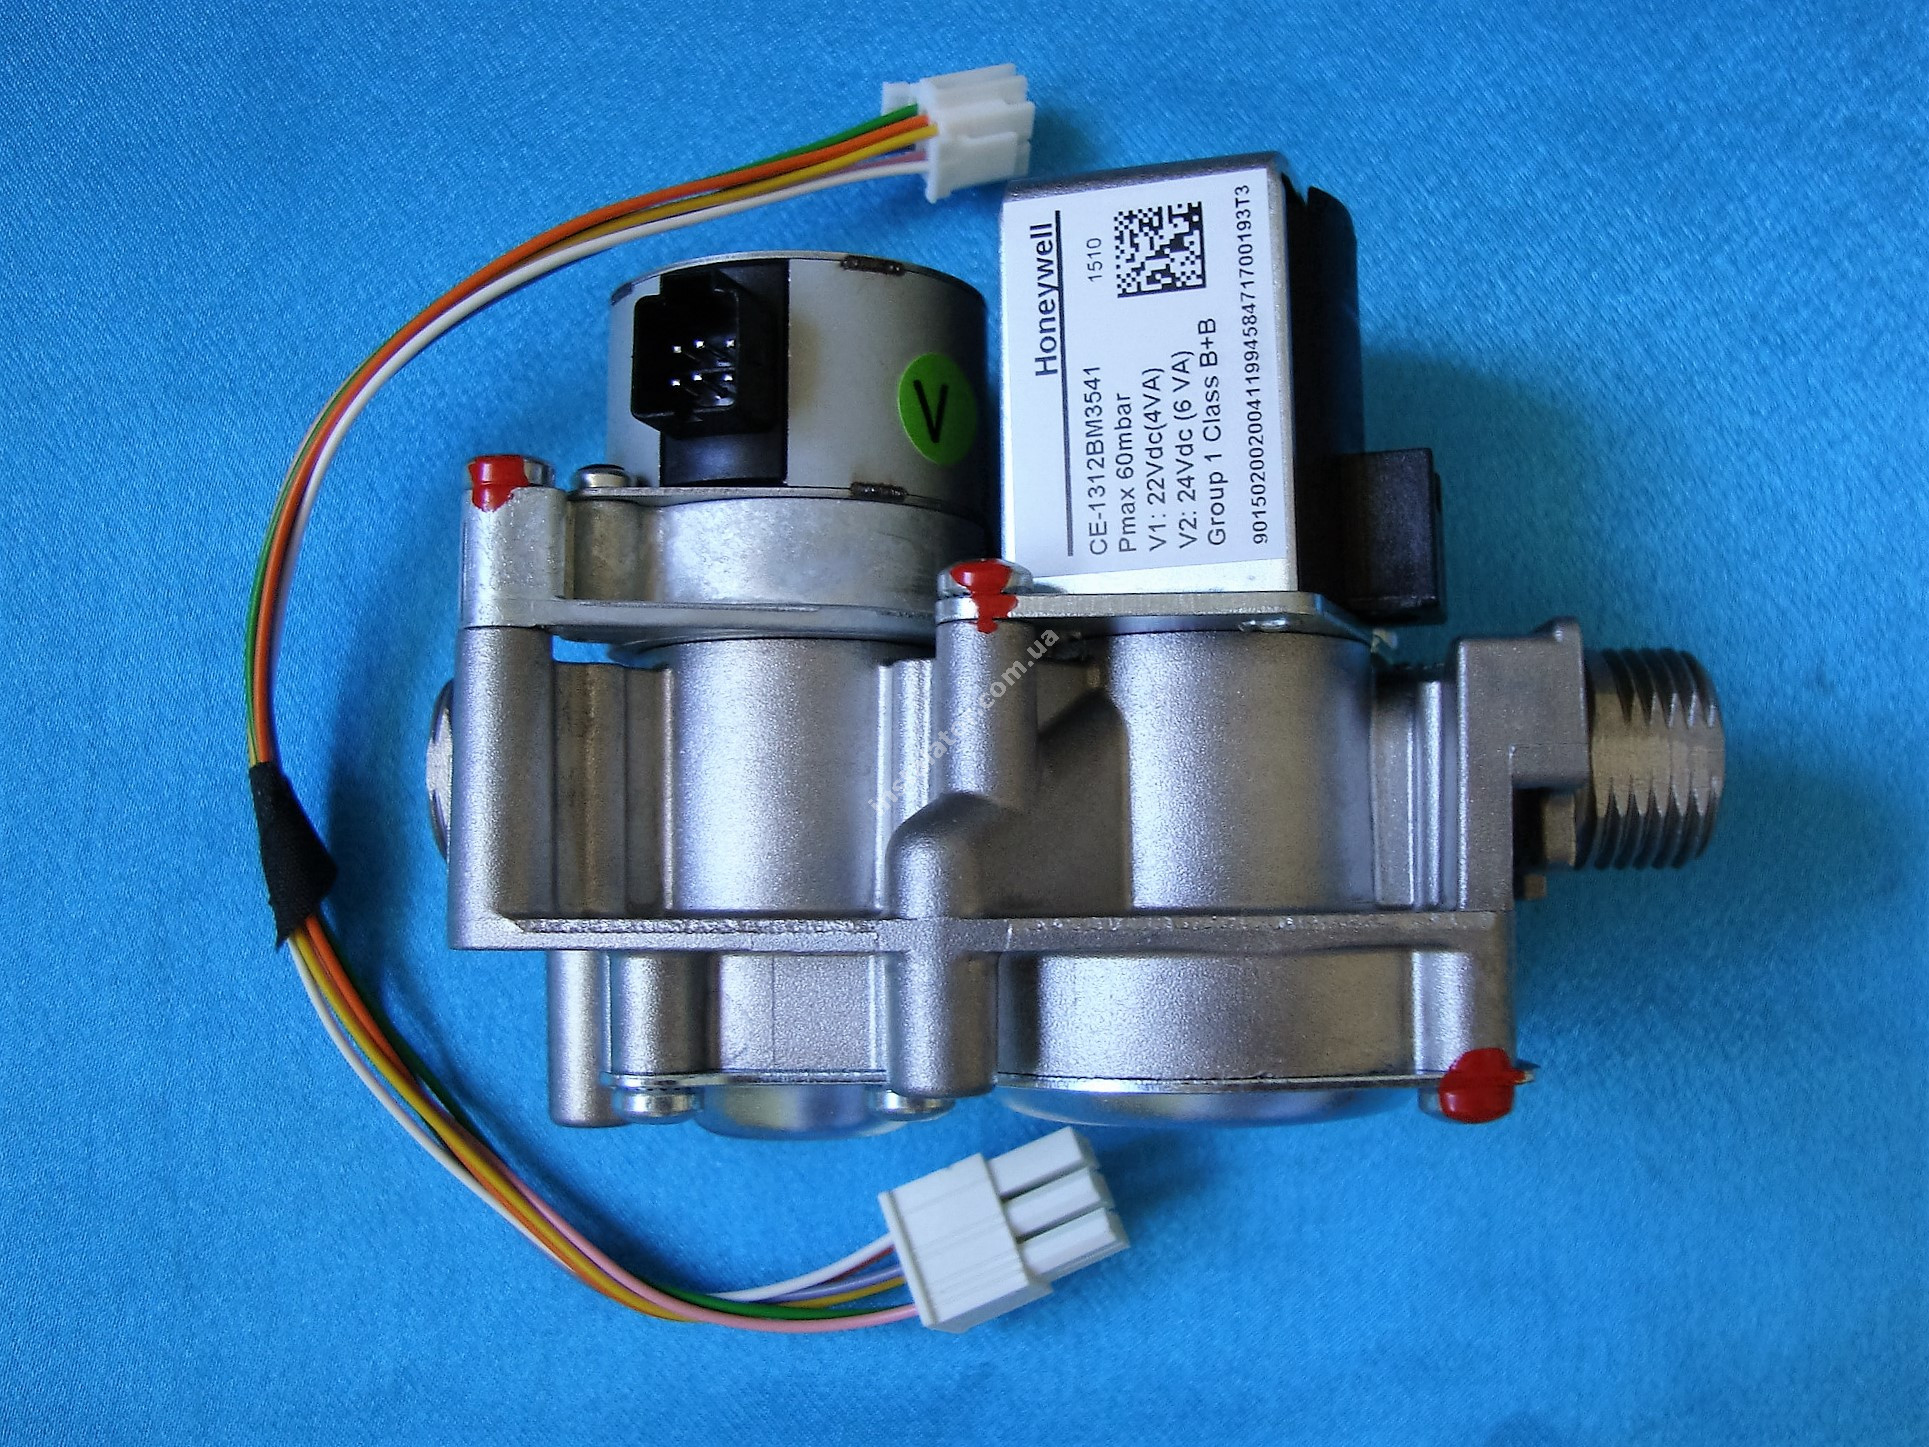 053520 Газовий клапан колонки VAILLANT MAG 16-0/0 XEA G20 (HONEYWELL CE-1312BM354)